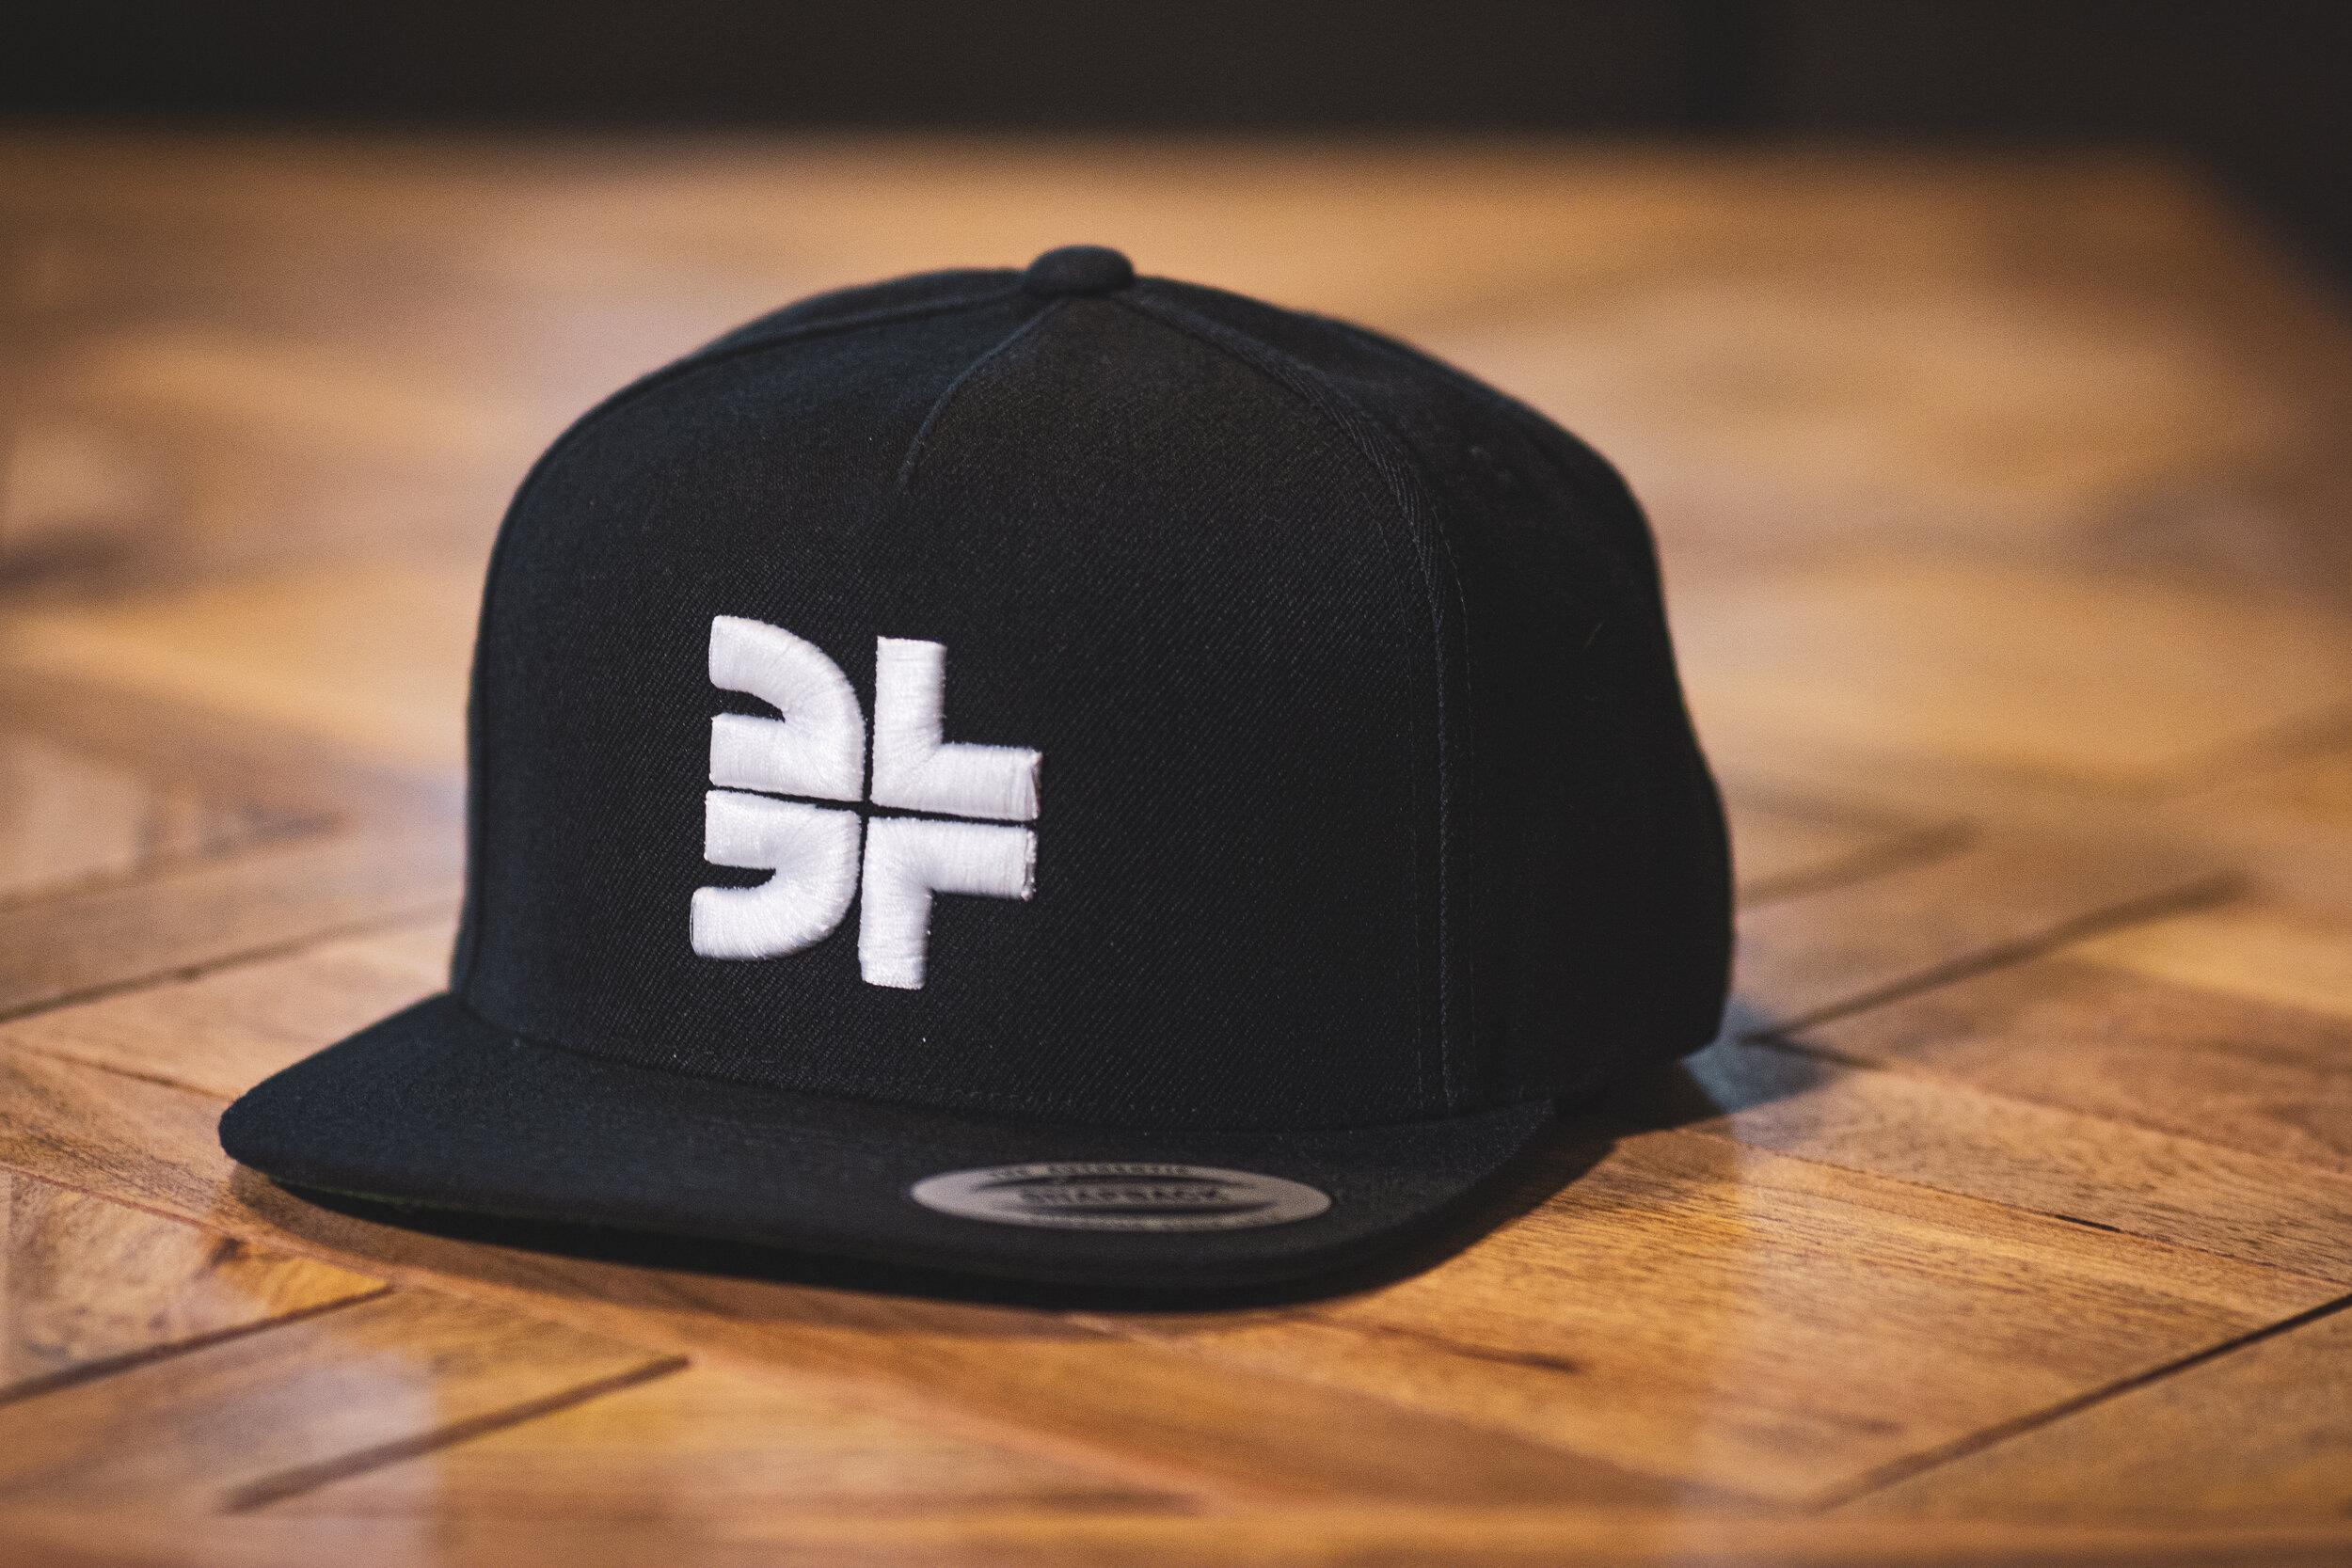 3&L Hat-9.jpg